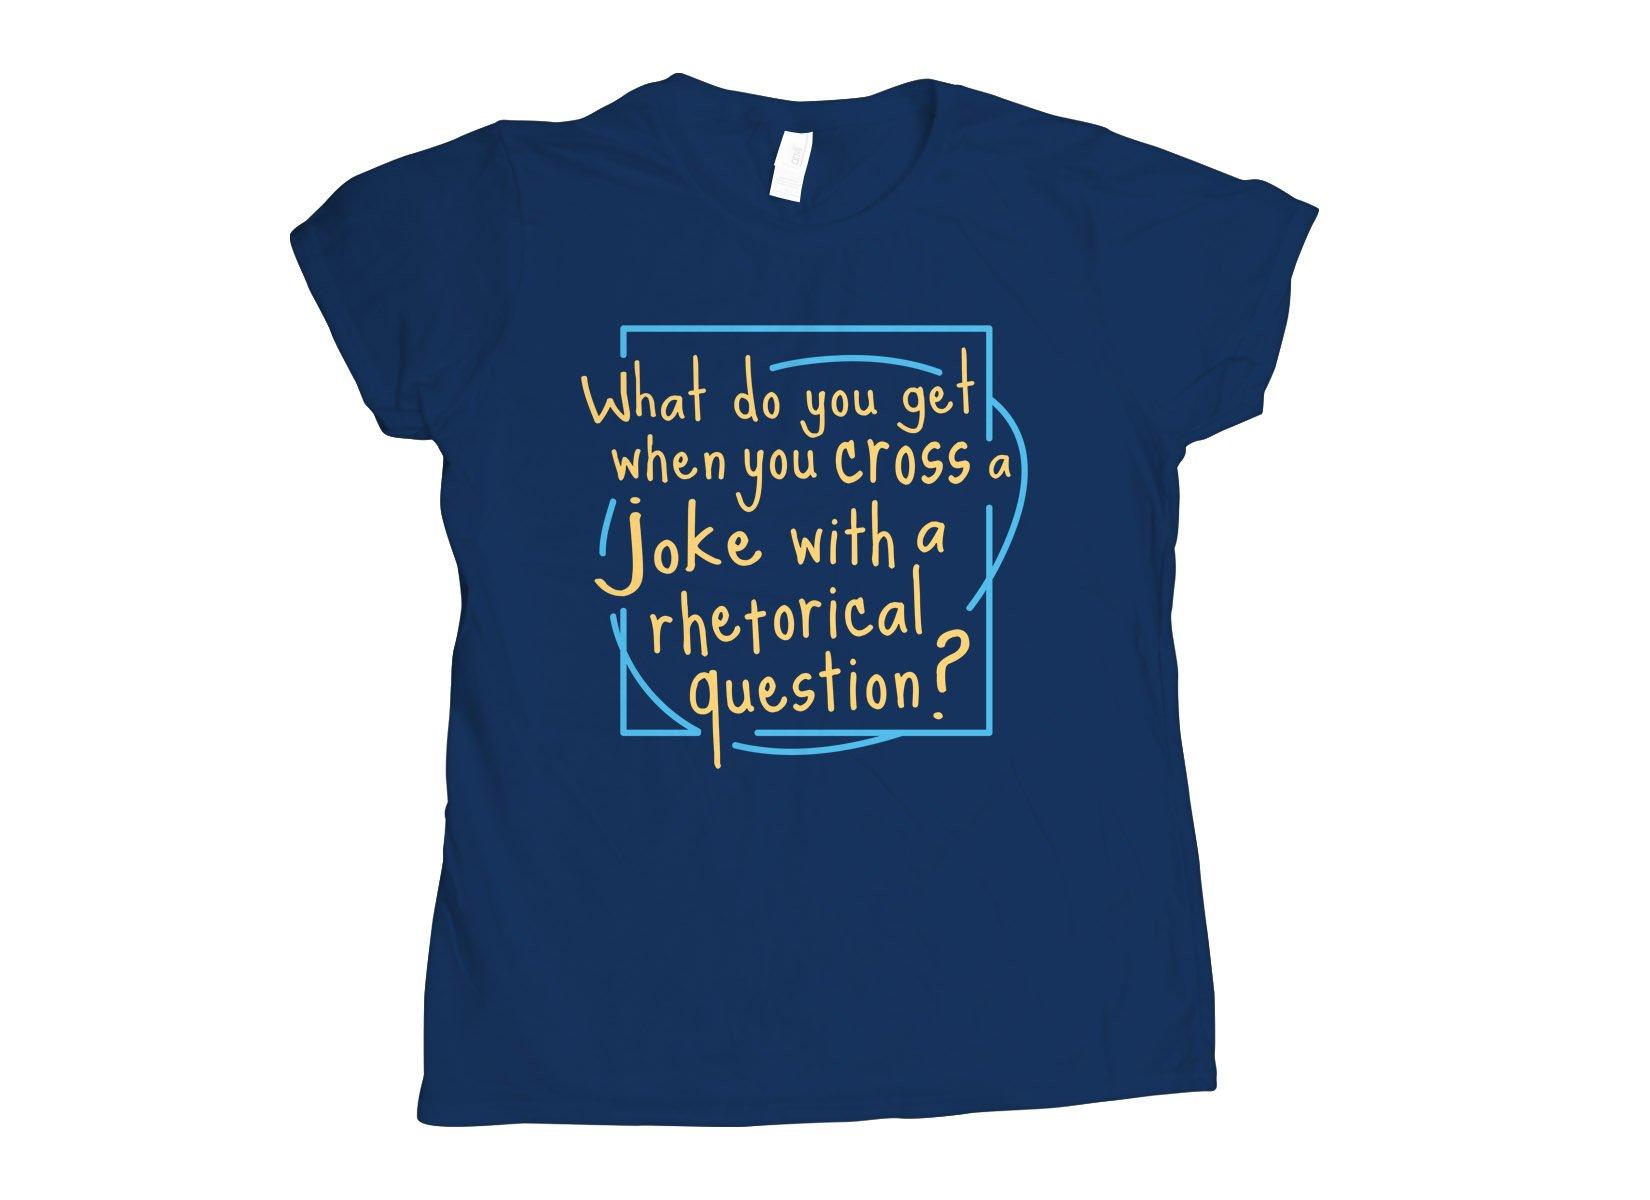 When You Cross A Joke With A Rhetorical Question? on Womens T-Shirt